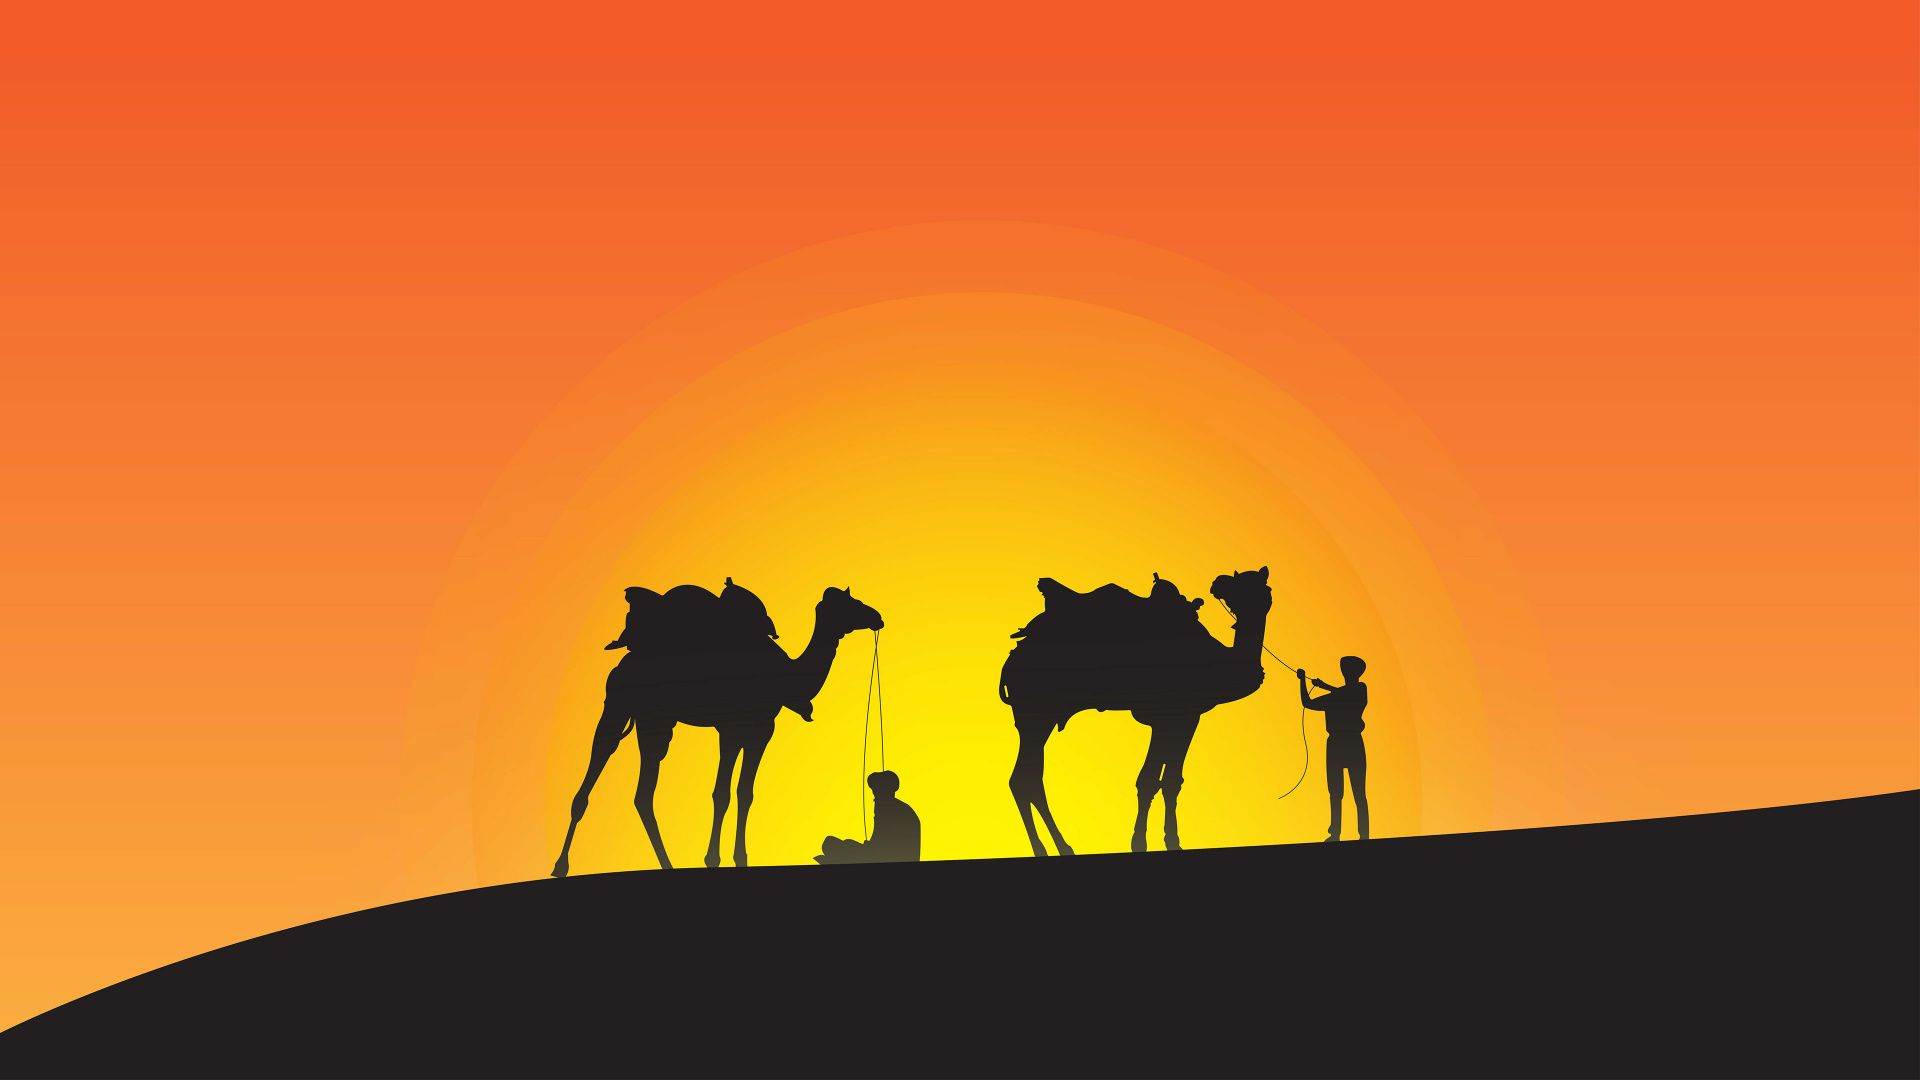 Camel Caravan Pattern